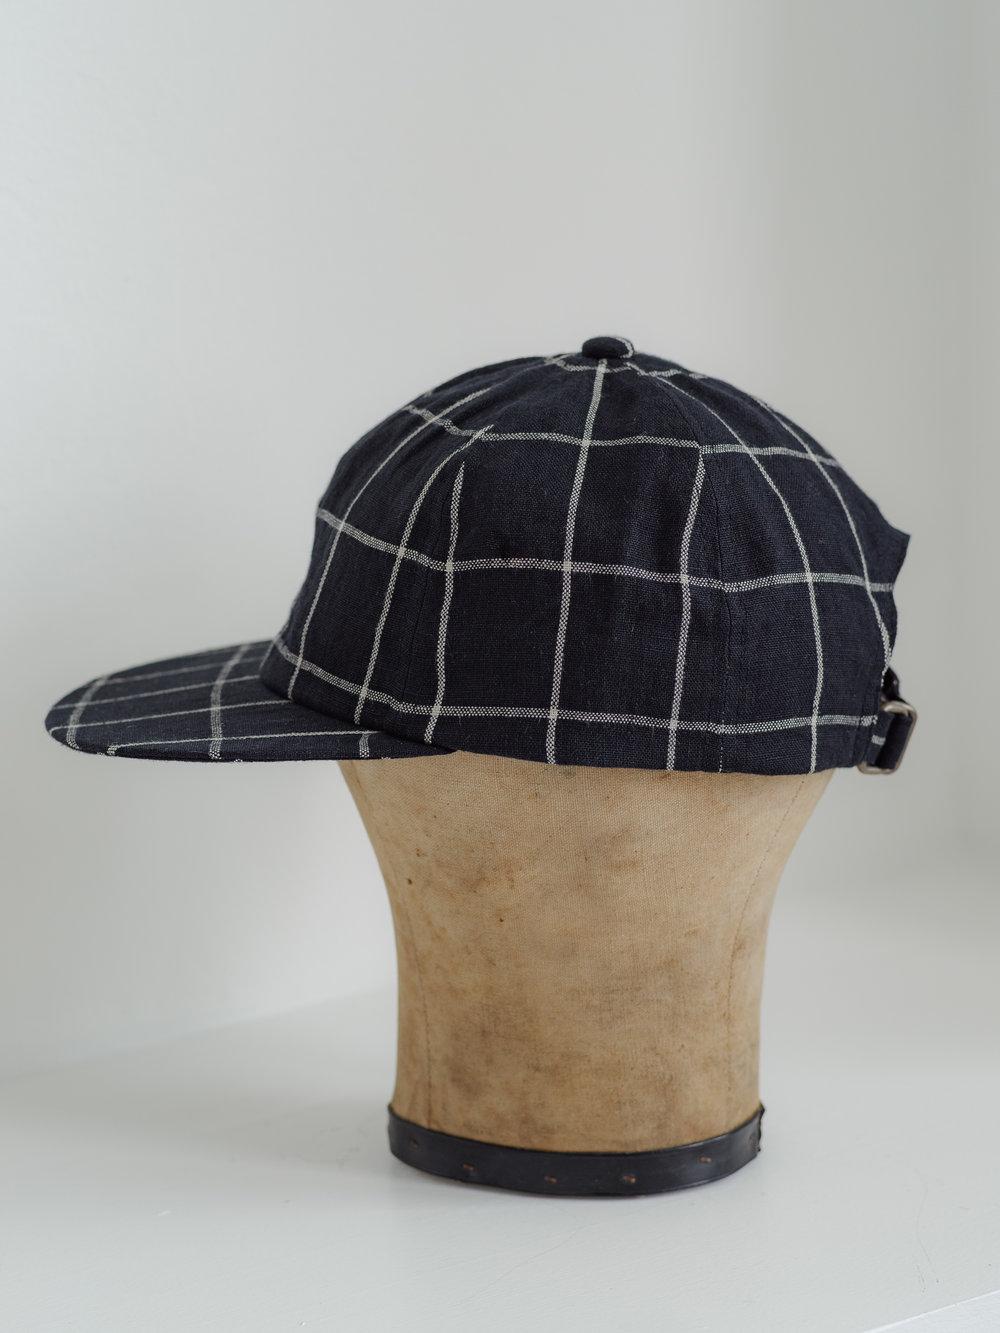 evan-kinori-ouji-yamada-handmade-hat-8